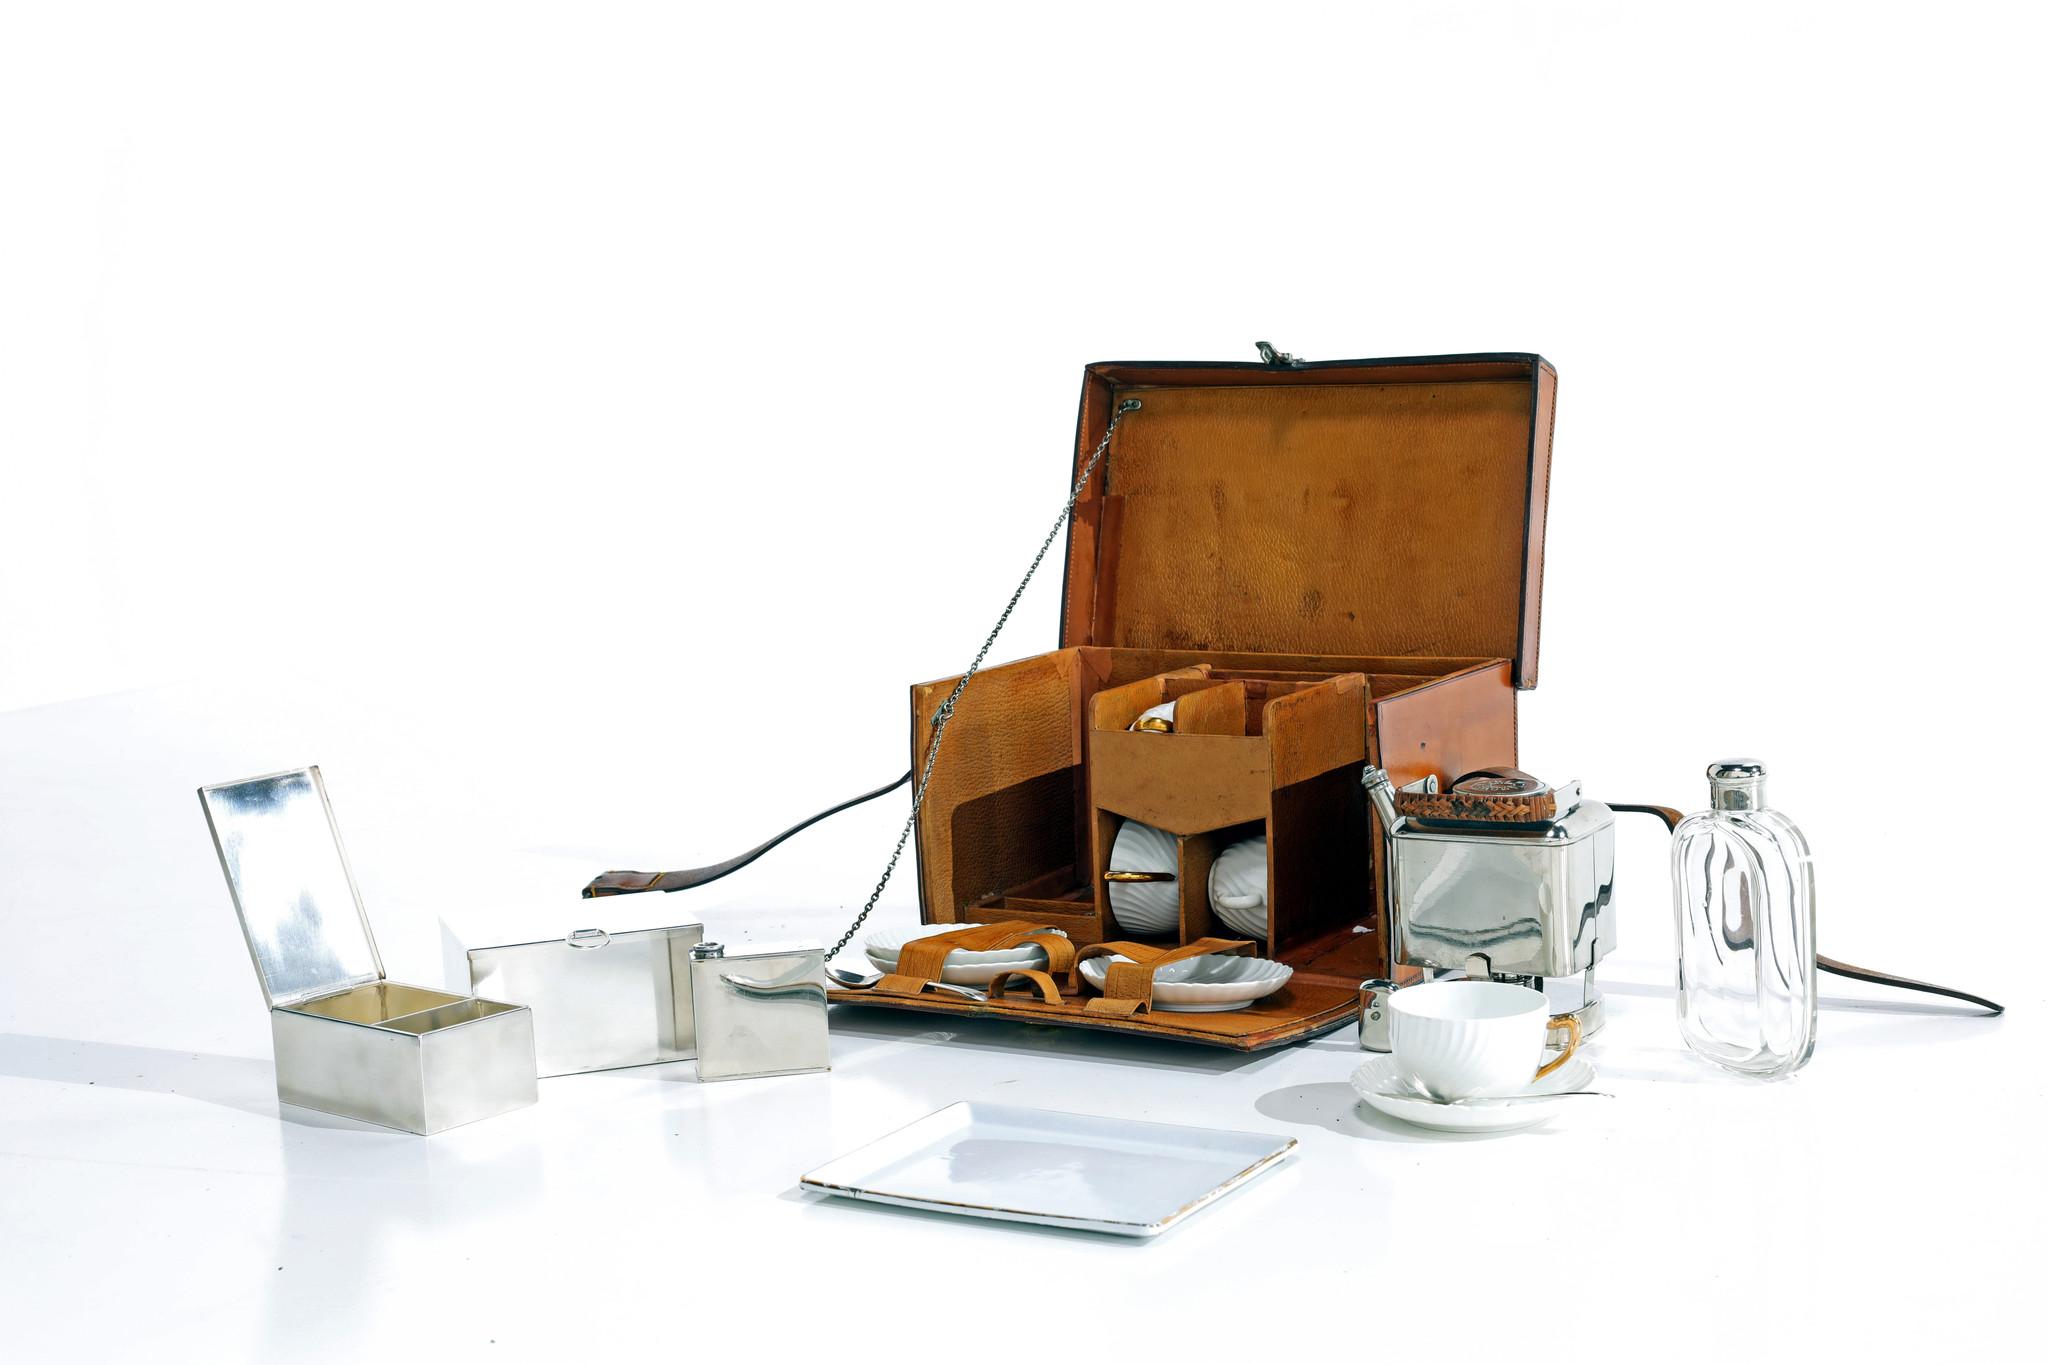 Exclusieve Moynat picknickset in lederen koffer circa 1910